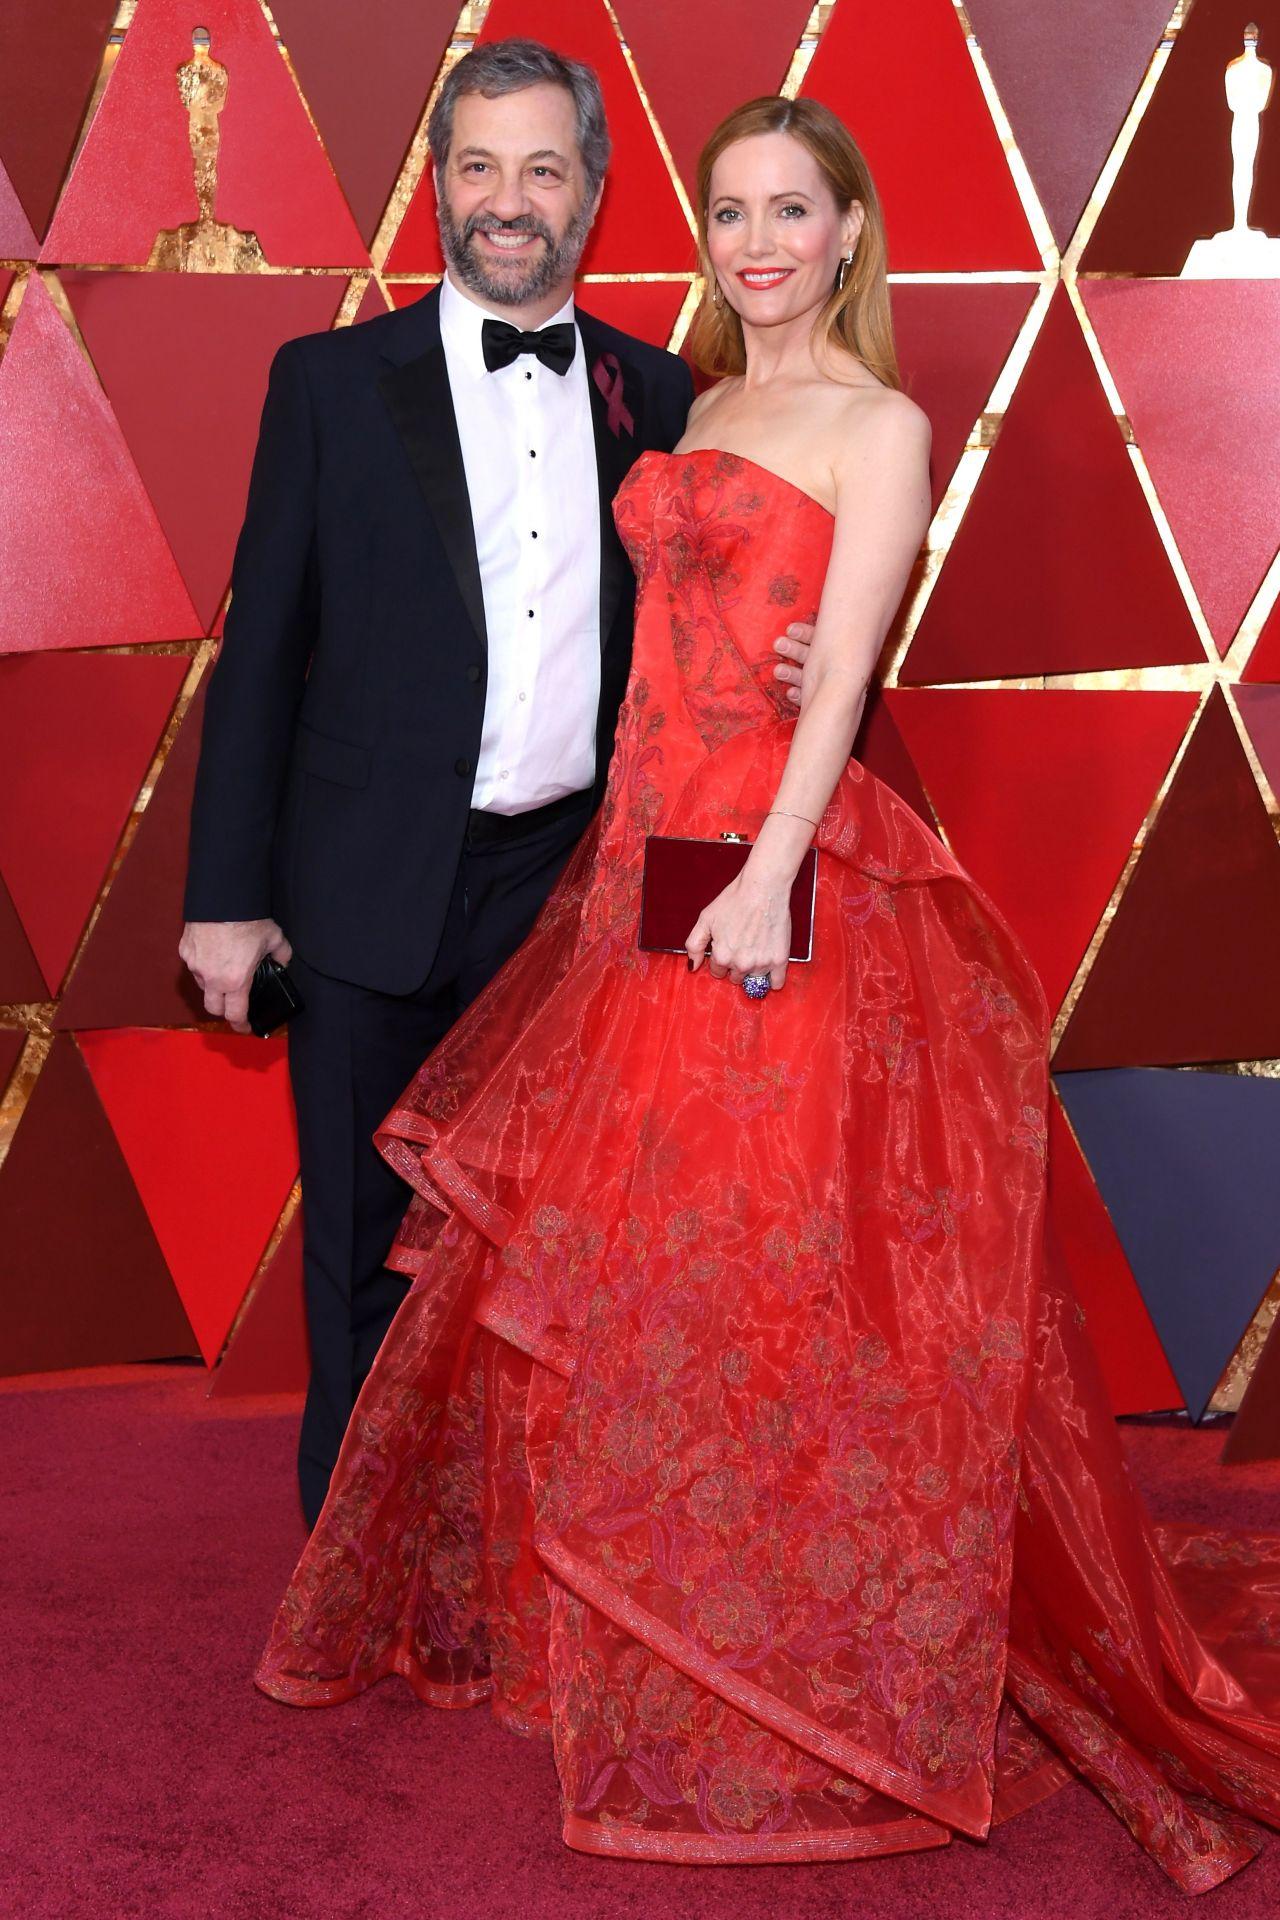 http://celebmafia.com/wp-content/uploads/2018/03/leslie-mann-oscars-2018-red-carpet-1.jpg